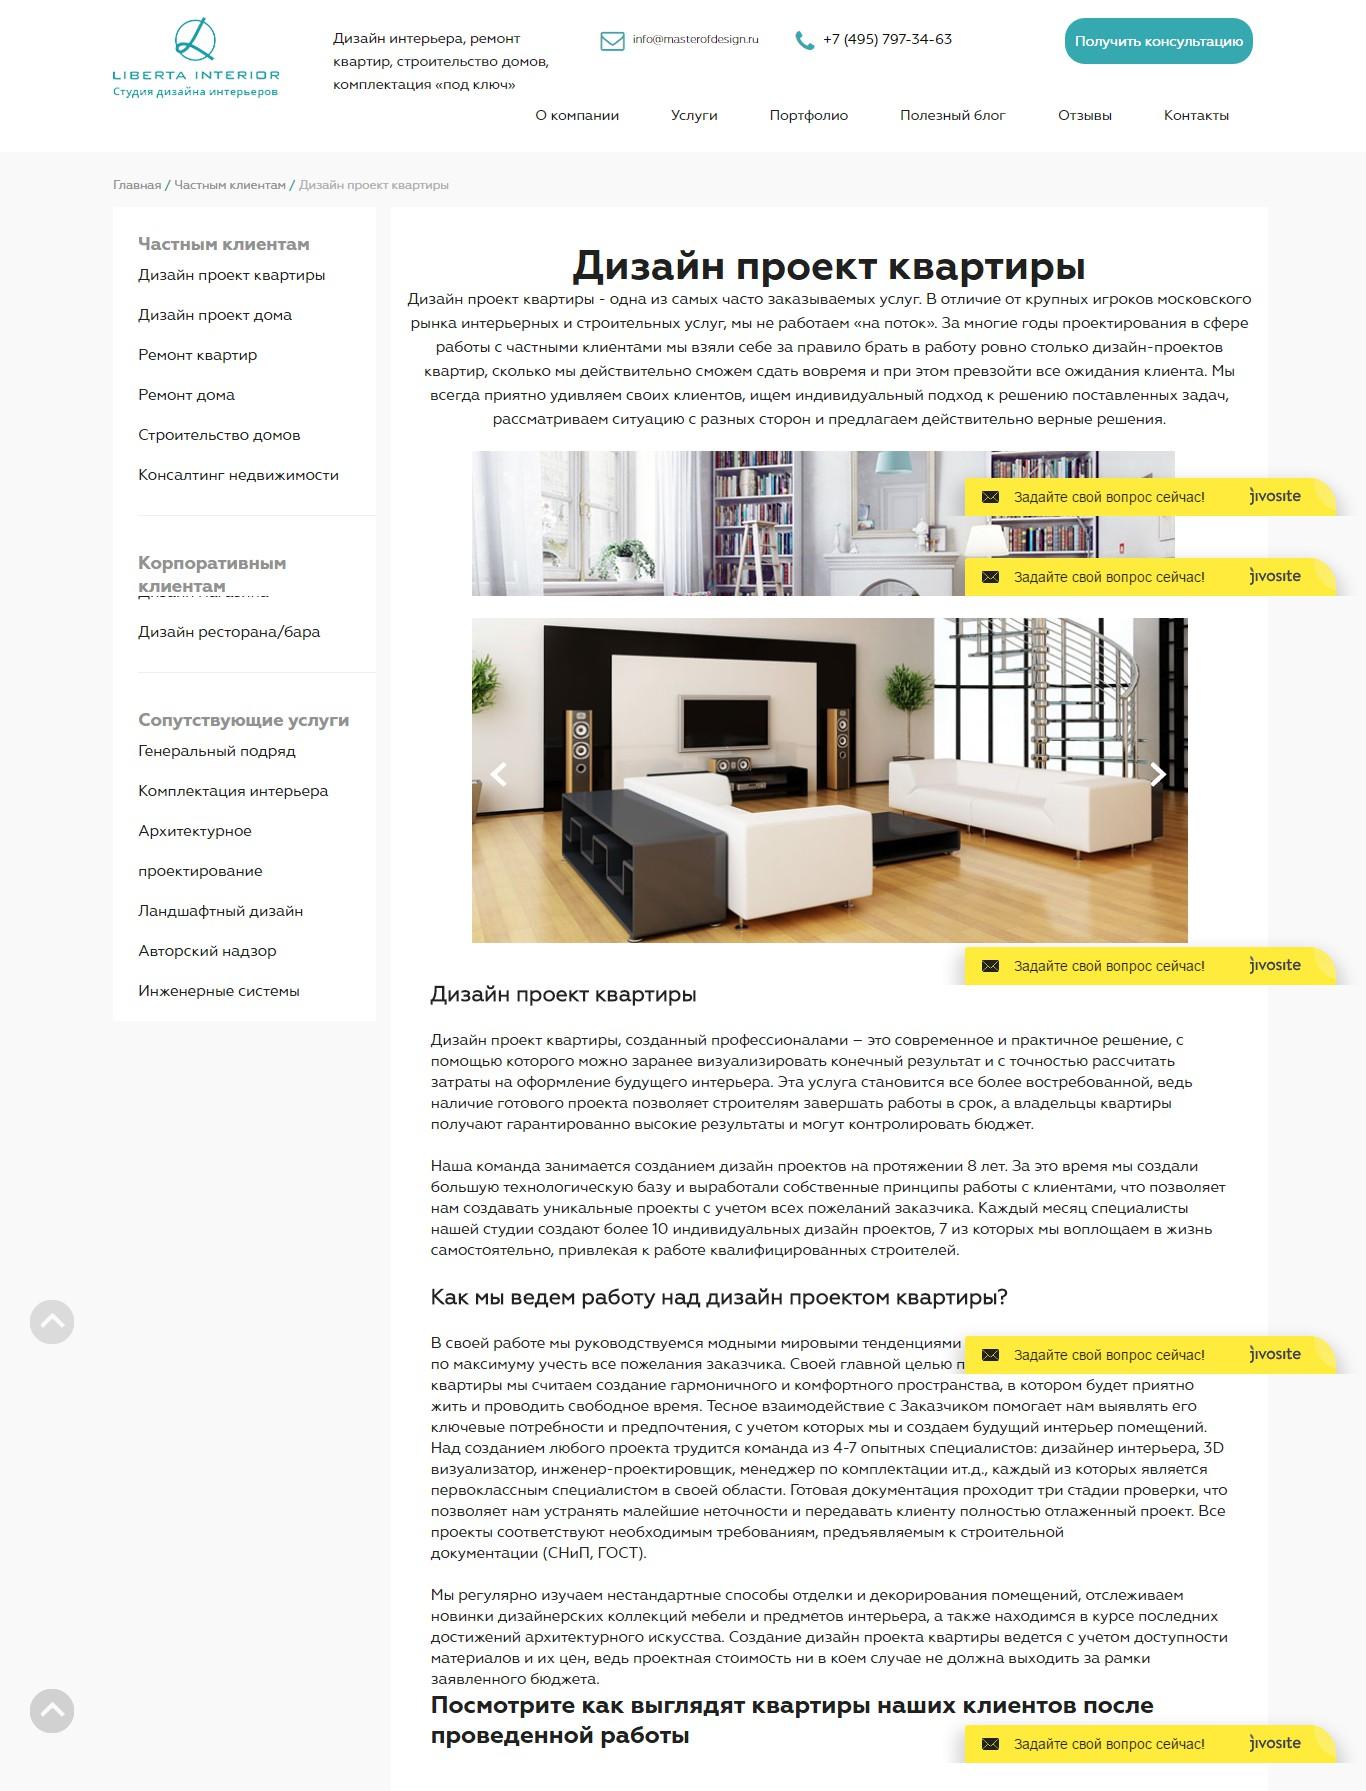 Услуги дизайн описание